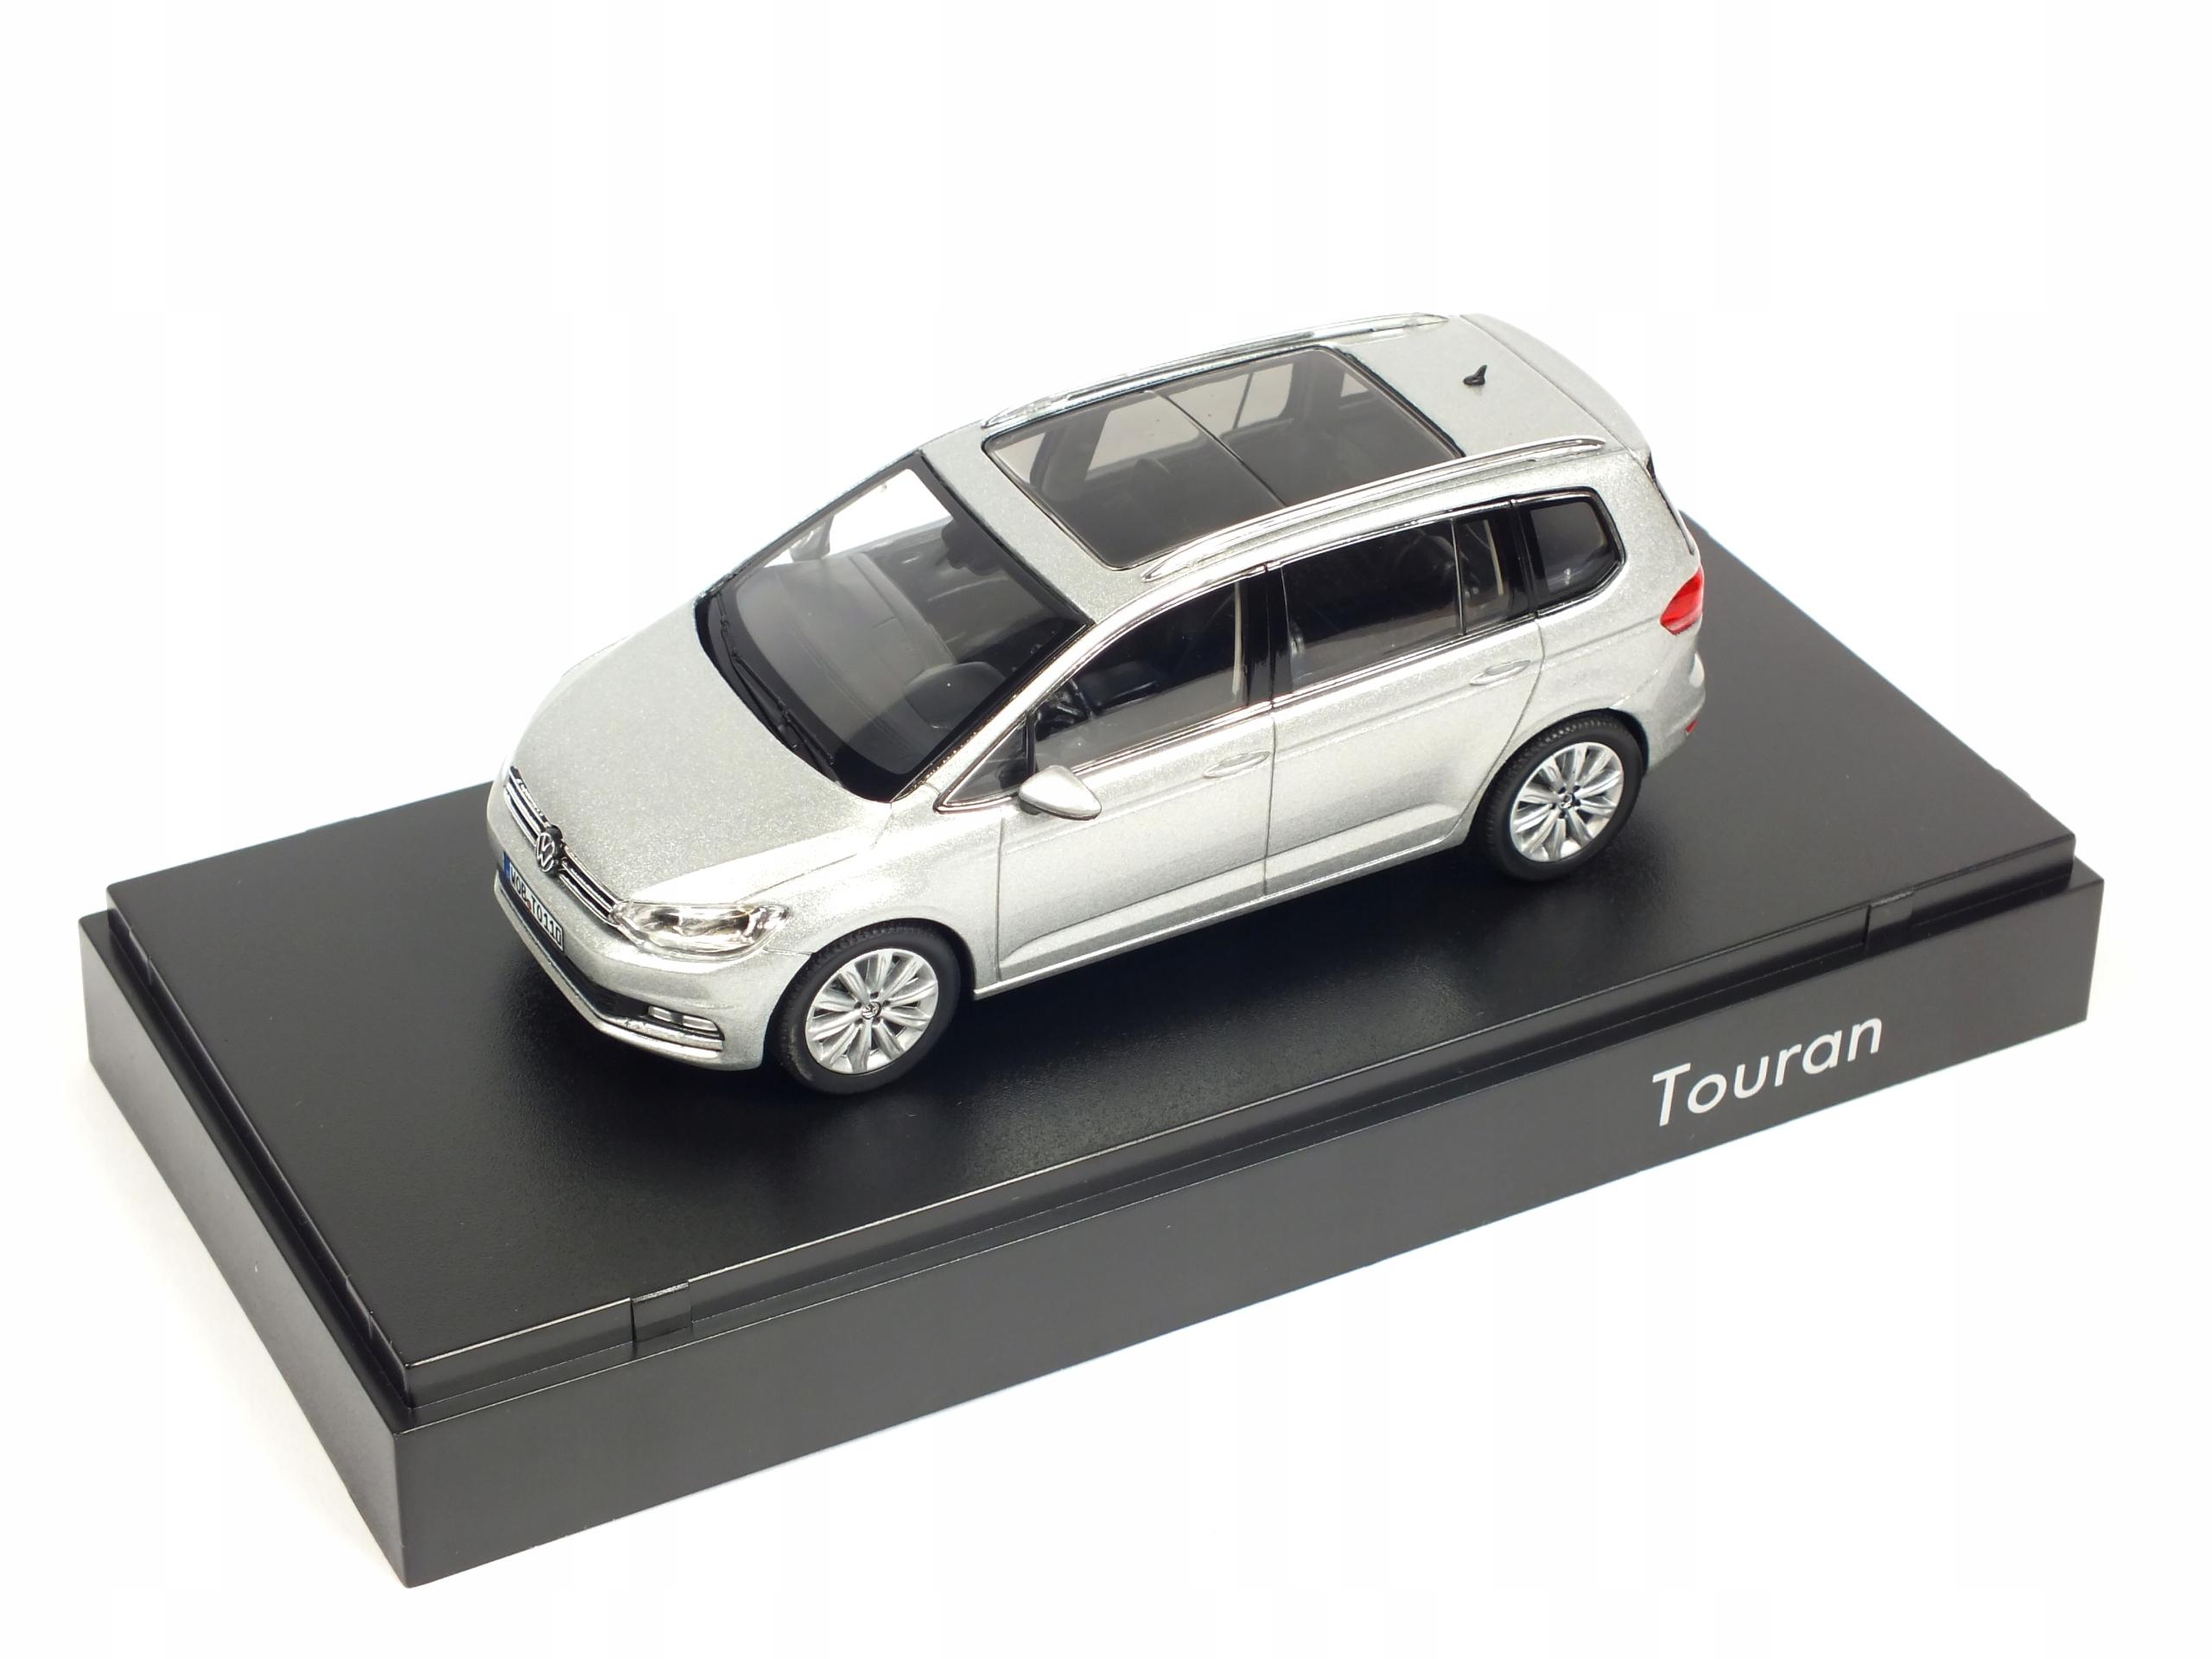 Model Samochodu Vw Touran 5t 1 43 Aso Nowosc Wroclaw Allegro Pl